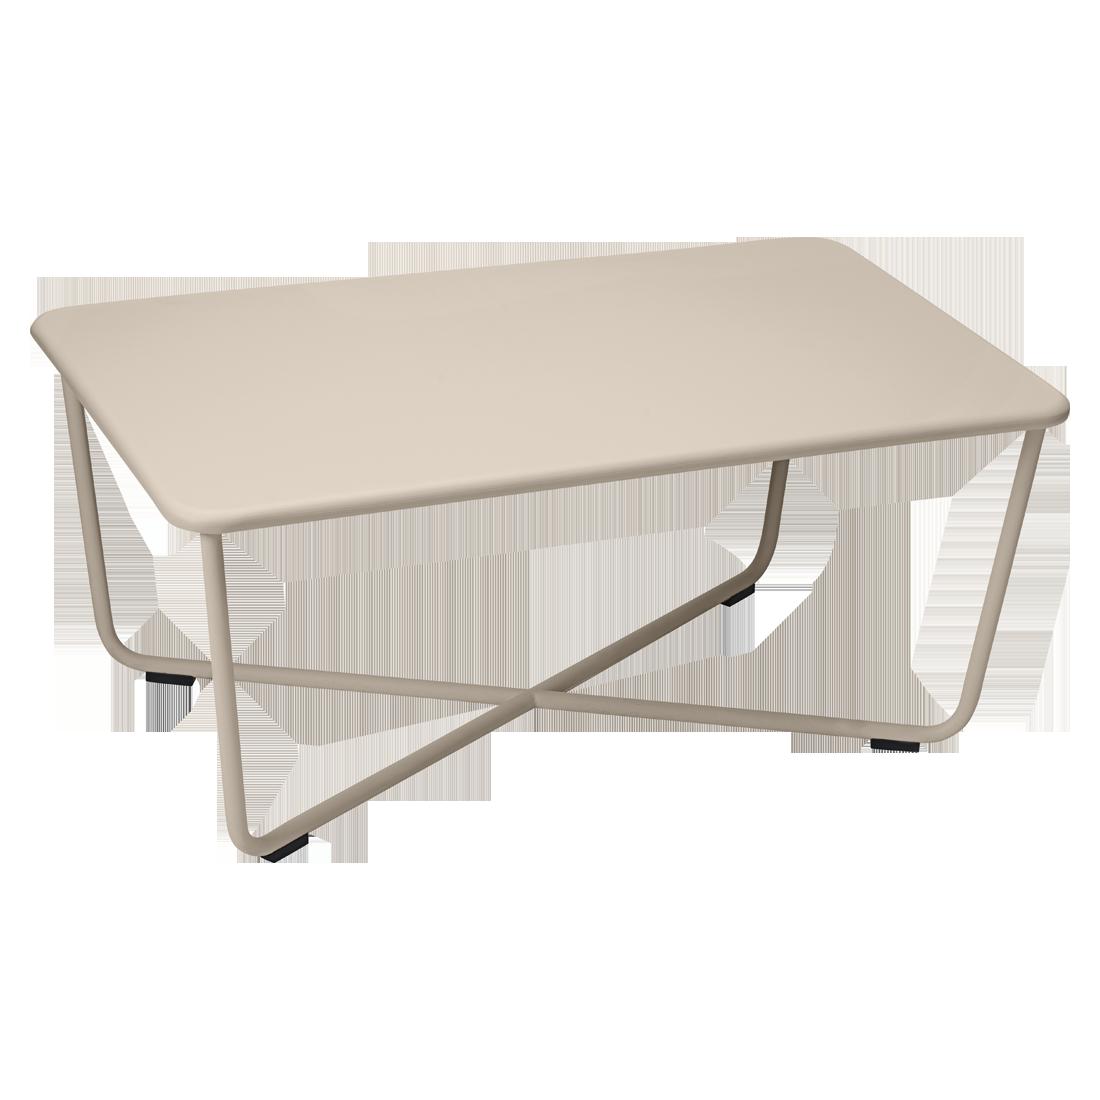 table basse croisette de fermob muscade. Black Bedroom Furniture Sets. Home Design Ideas